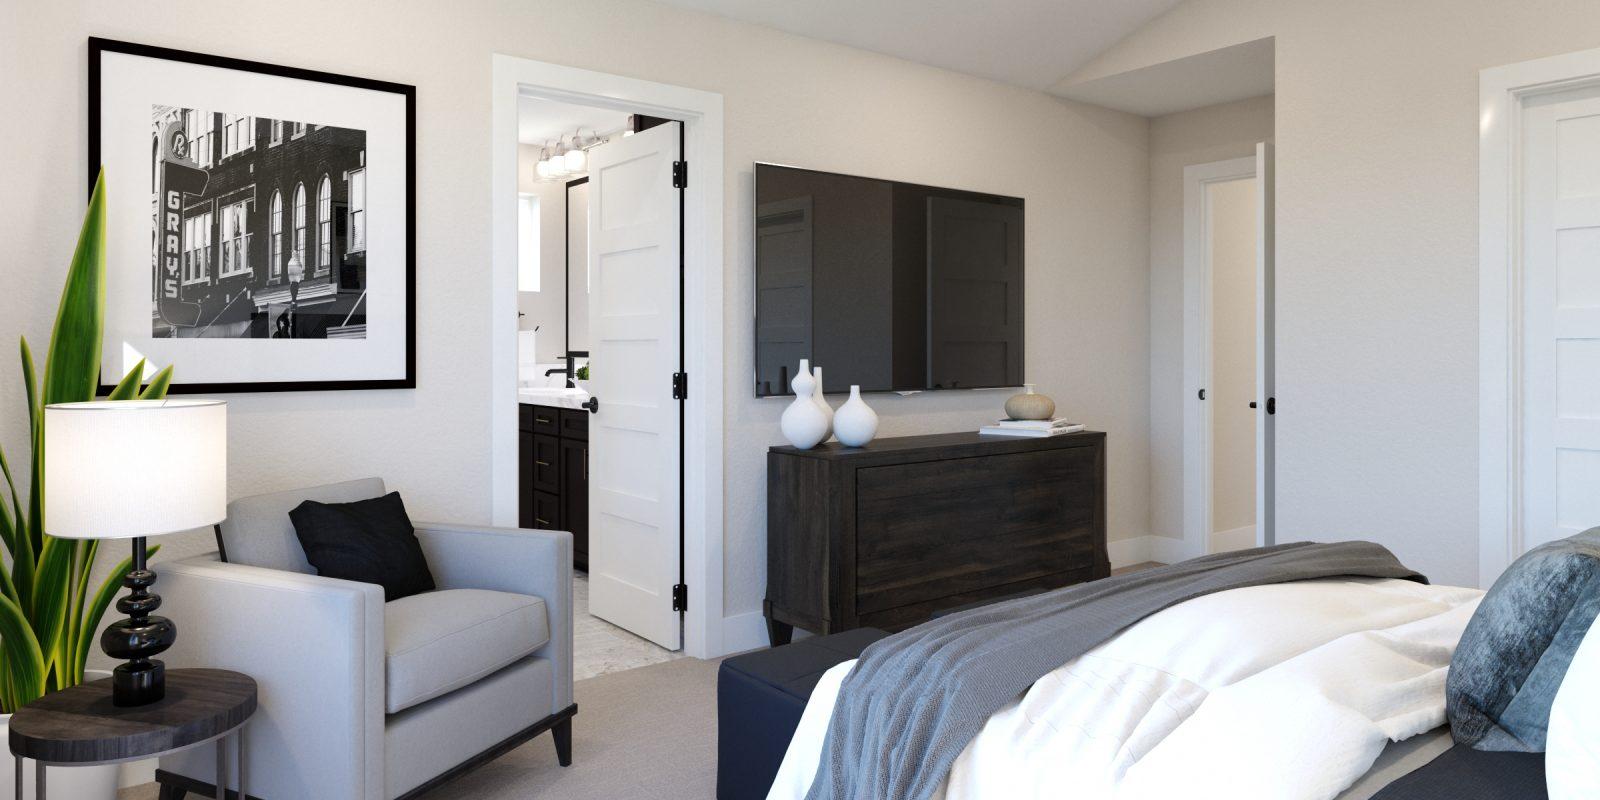 Downtown Superior: Promenade - Primary Bedroom